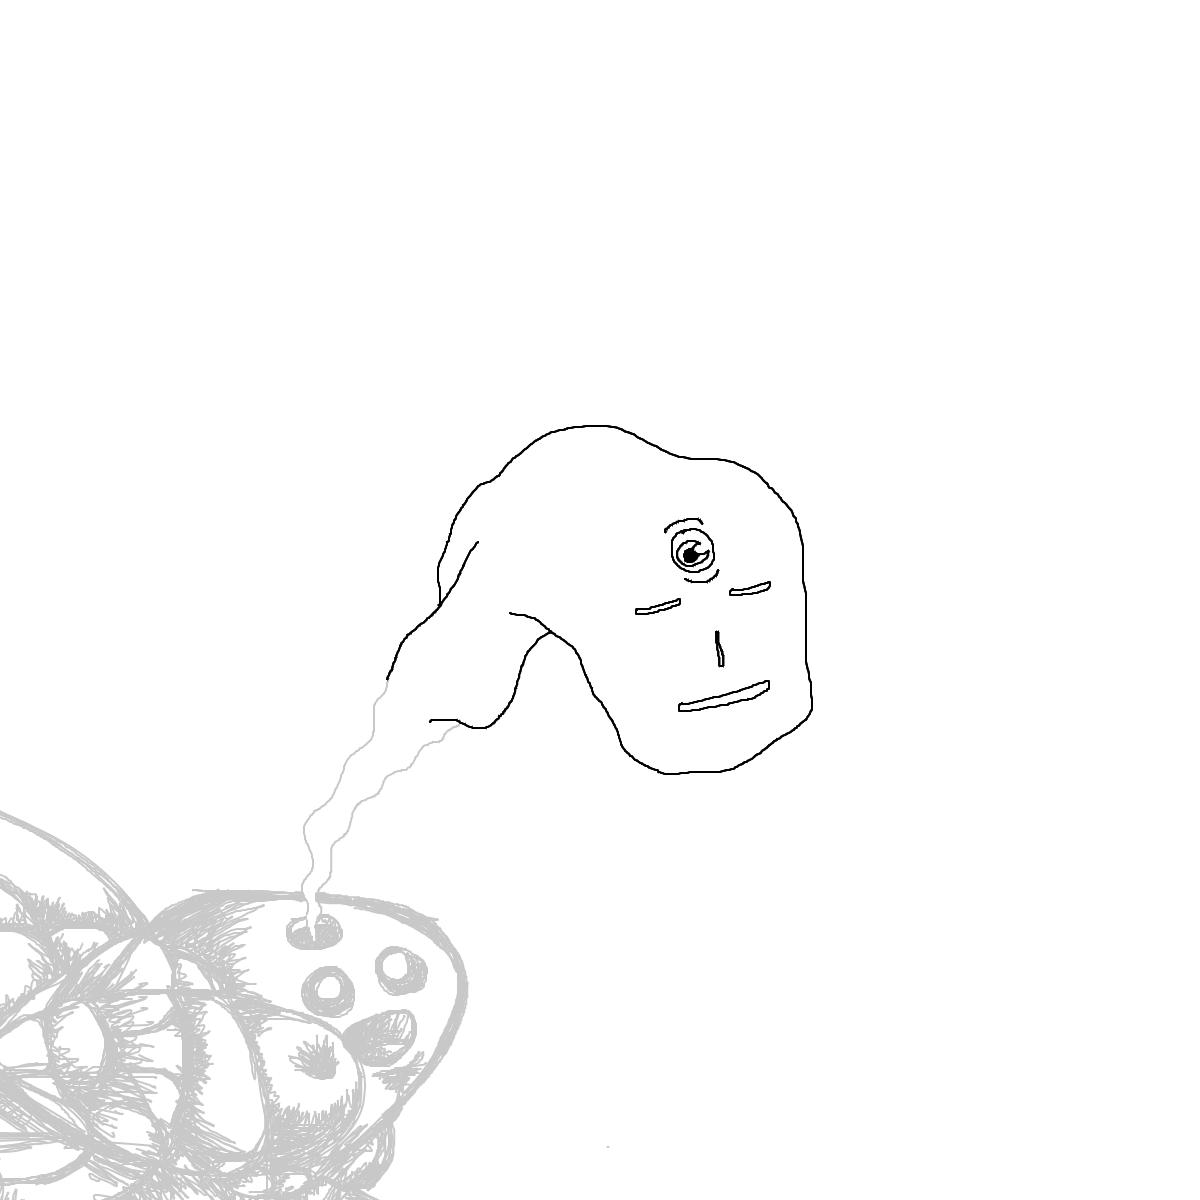 BAAAM drawing#7614 lat:42.8566818237304700lng: -2.7166578769683840